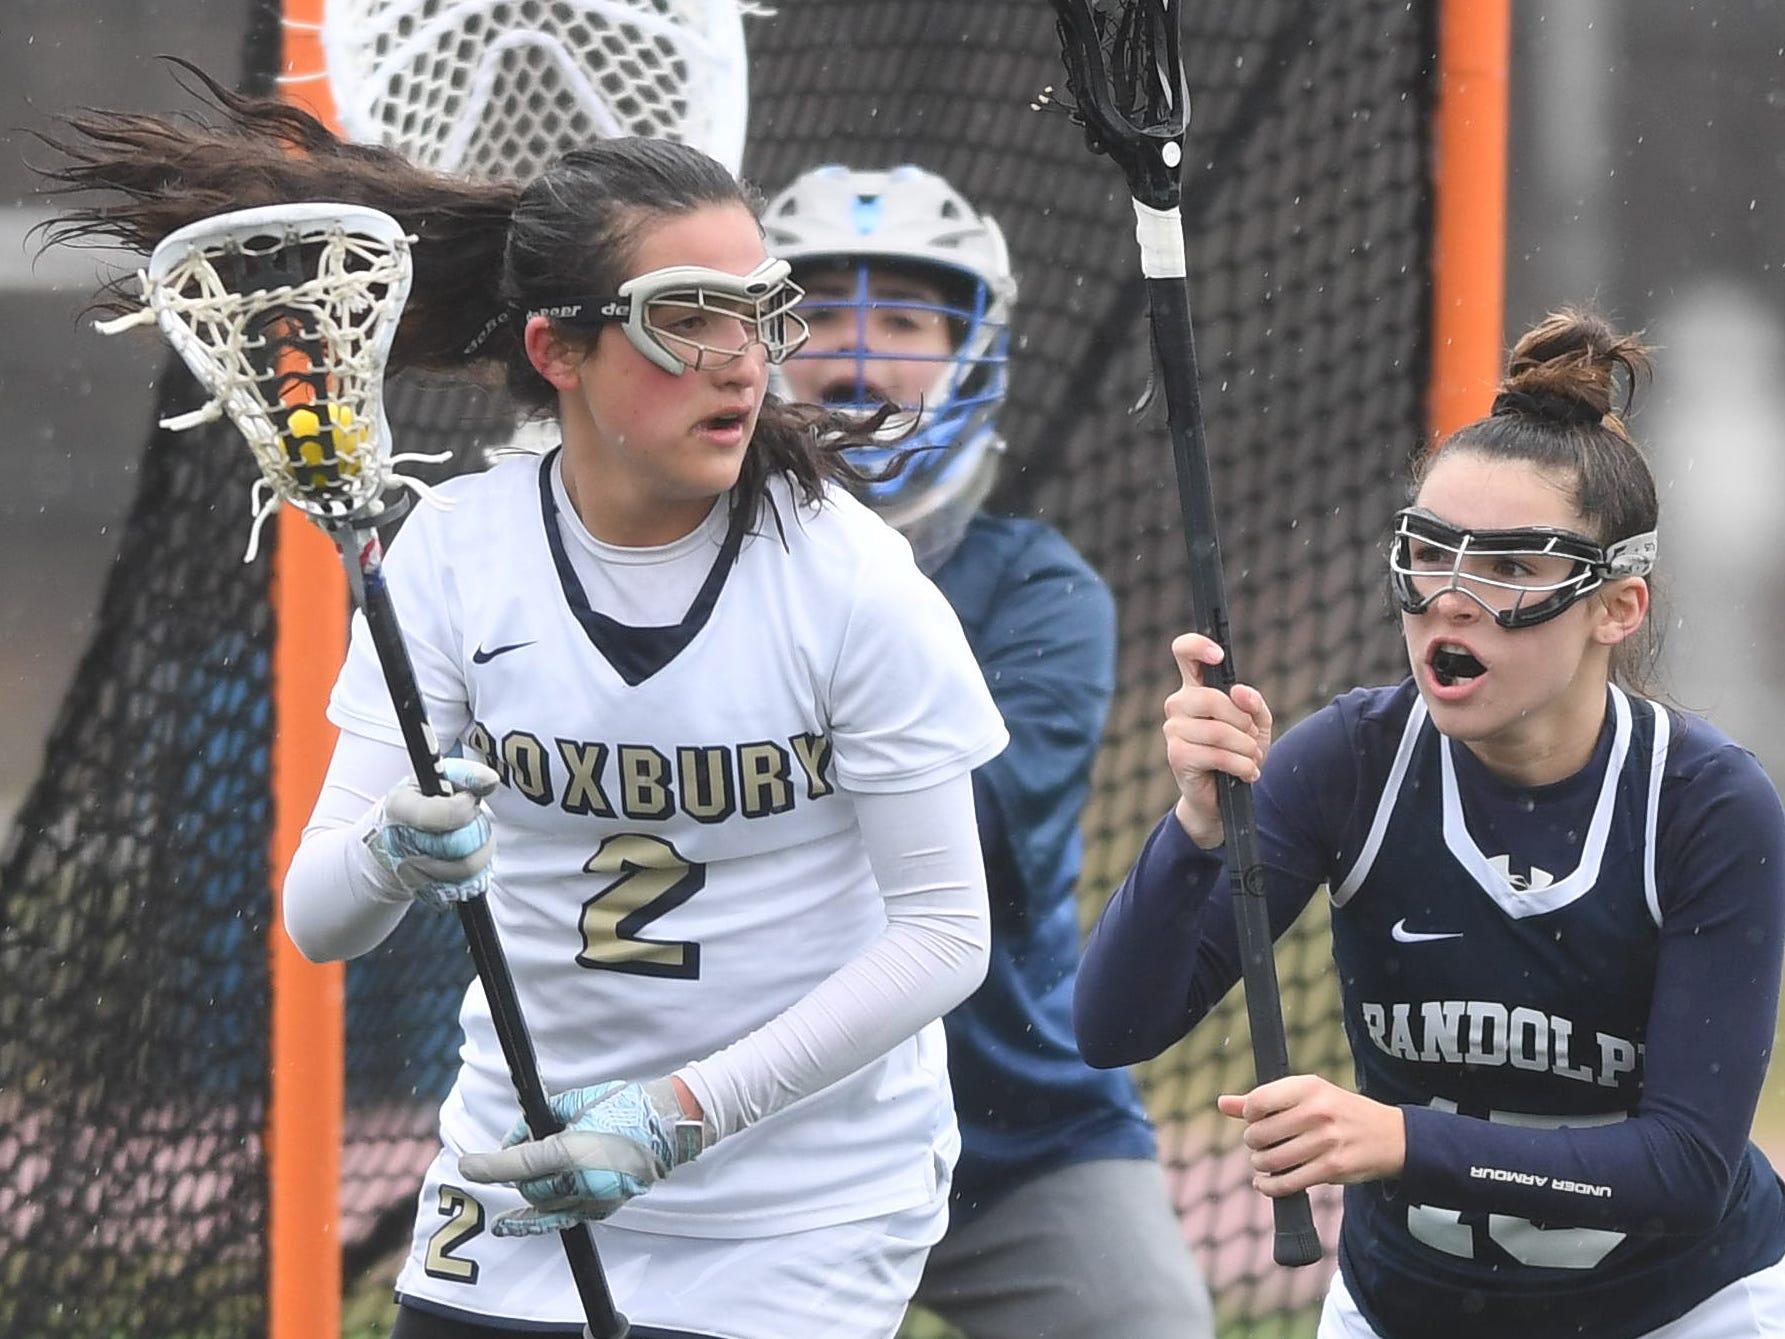 Randolph girls lacrosse at Roxbury on Friday, April 5, 2019. Roxbury  #2 Emily Stanich and Randolph #15 Kiara Iannacconi.